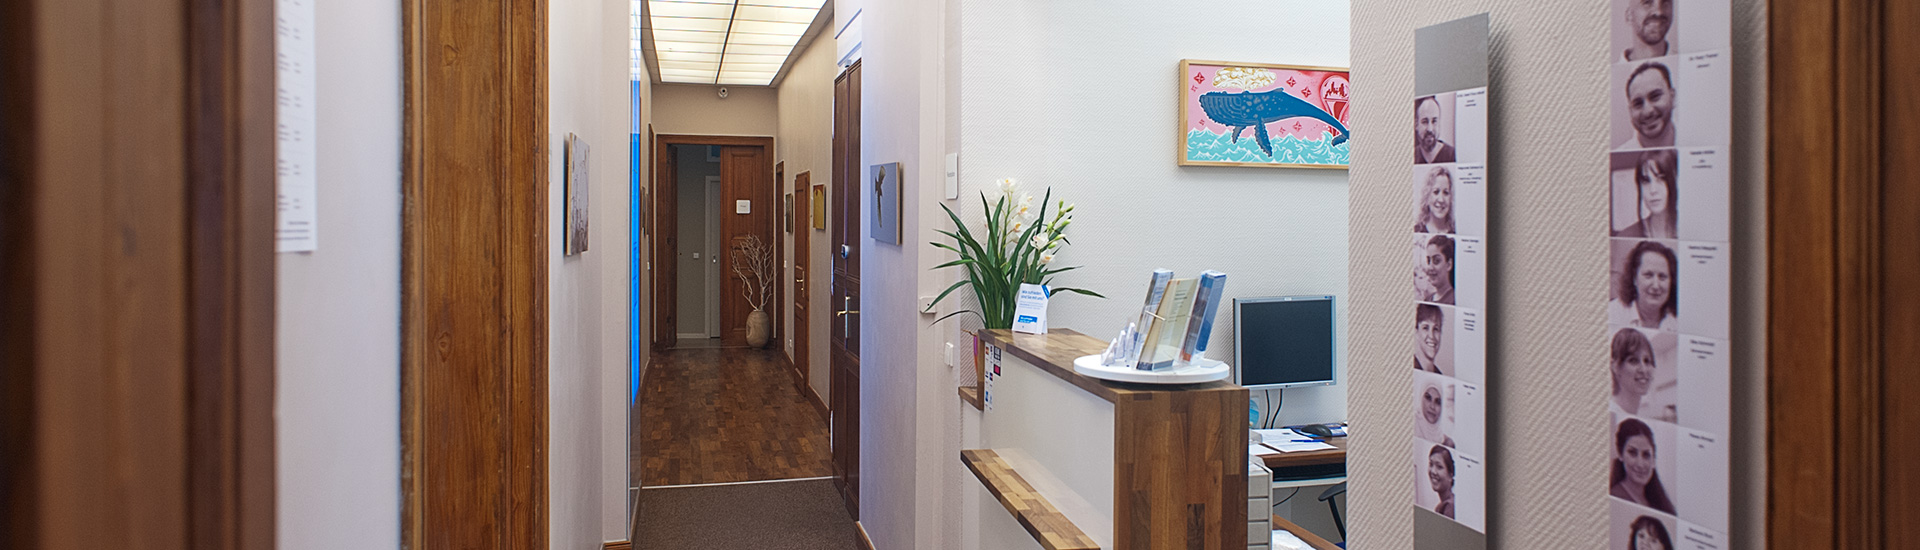 Zahnzentrum-Neukoelln-Berlin-Zahnarzt-Empfang